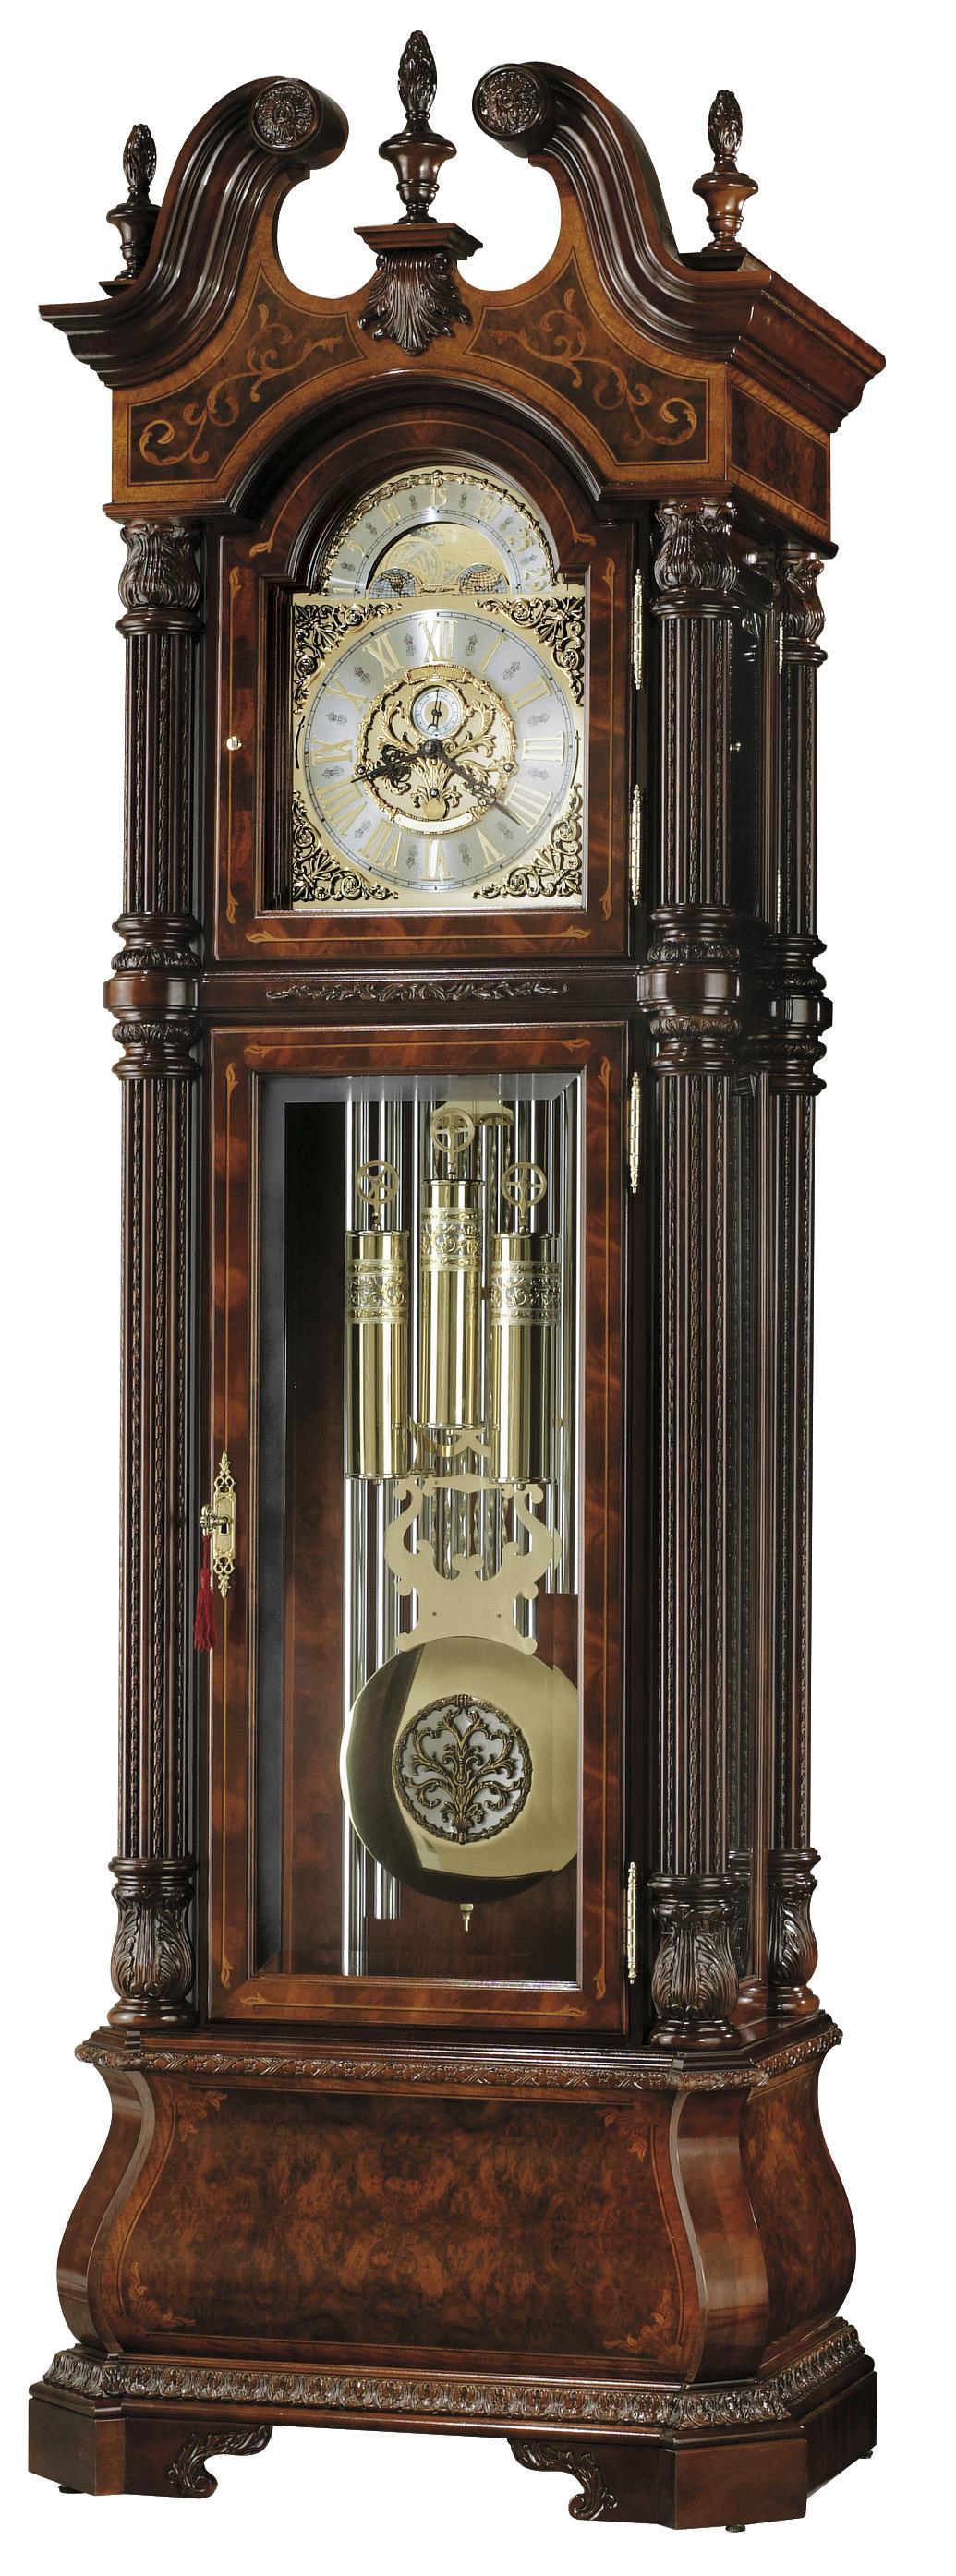 Clocks J.H. Miller II Grandfather Clock by Howard Miller at Alison Craig Home Furnishings